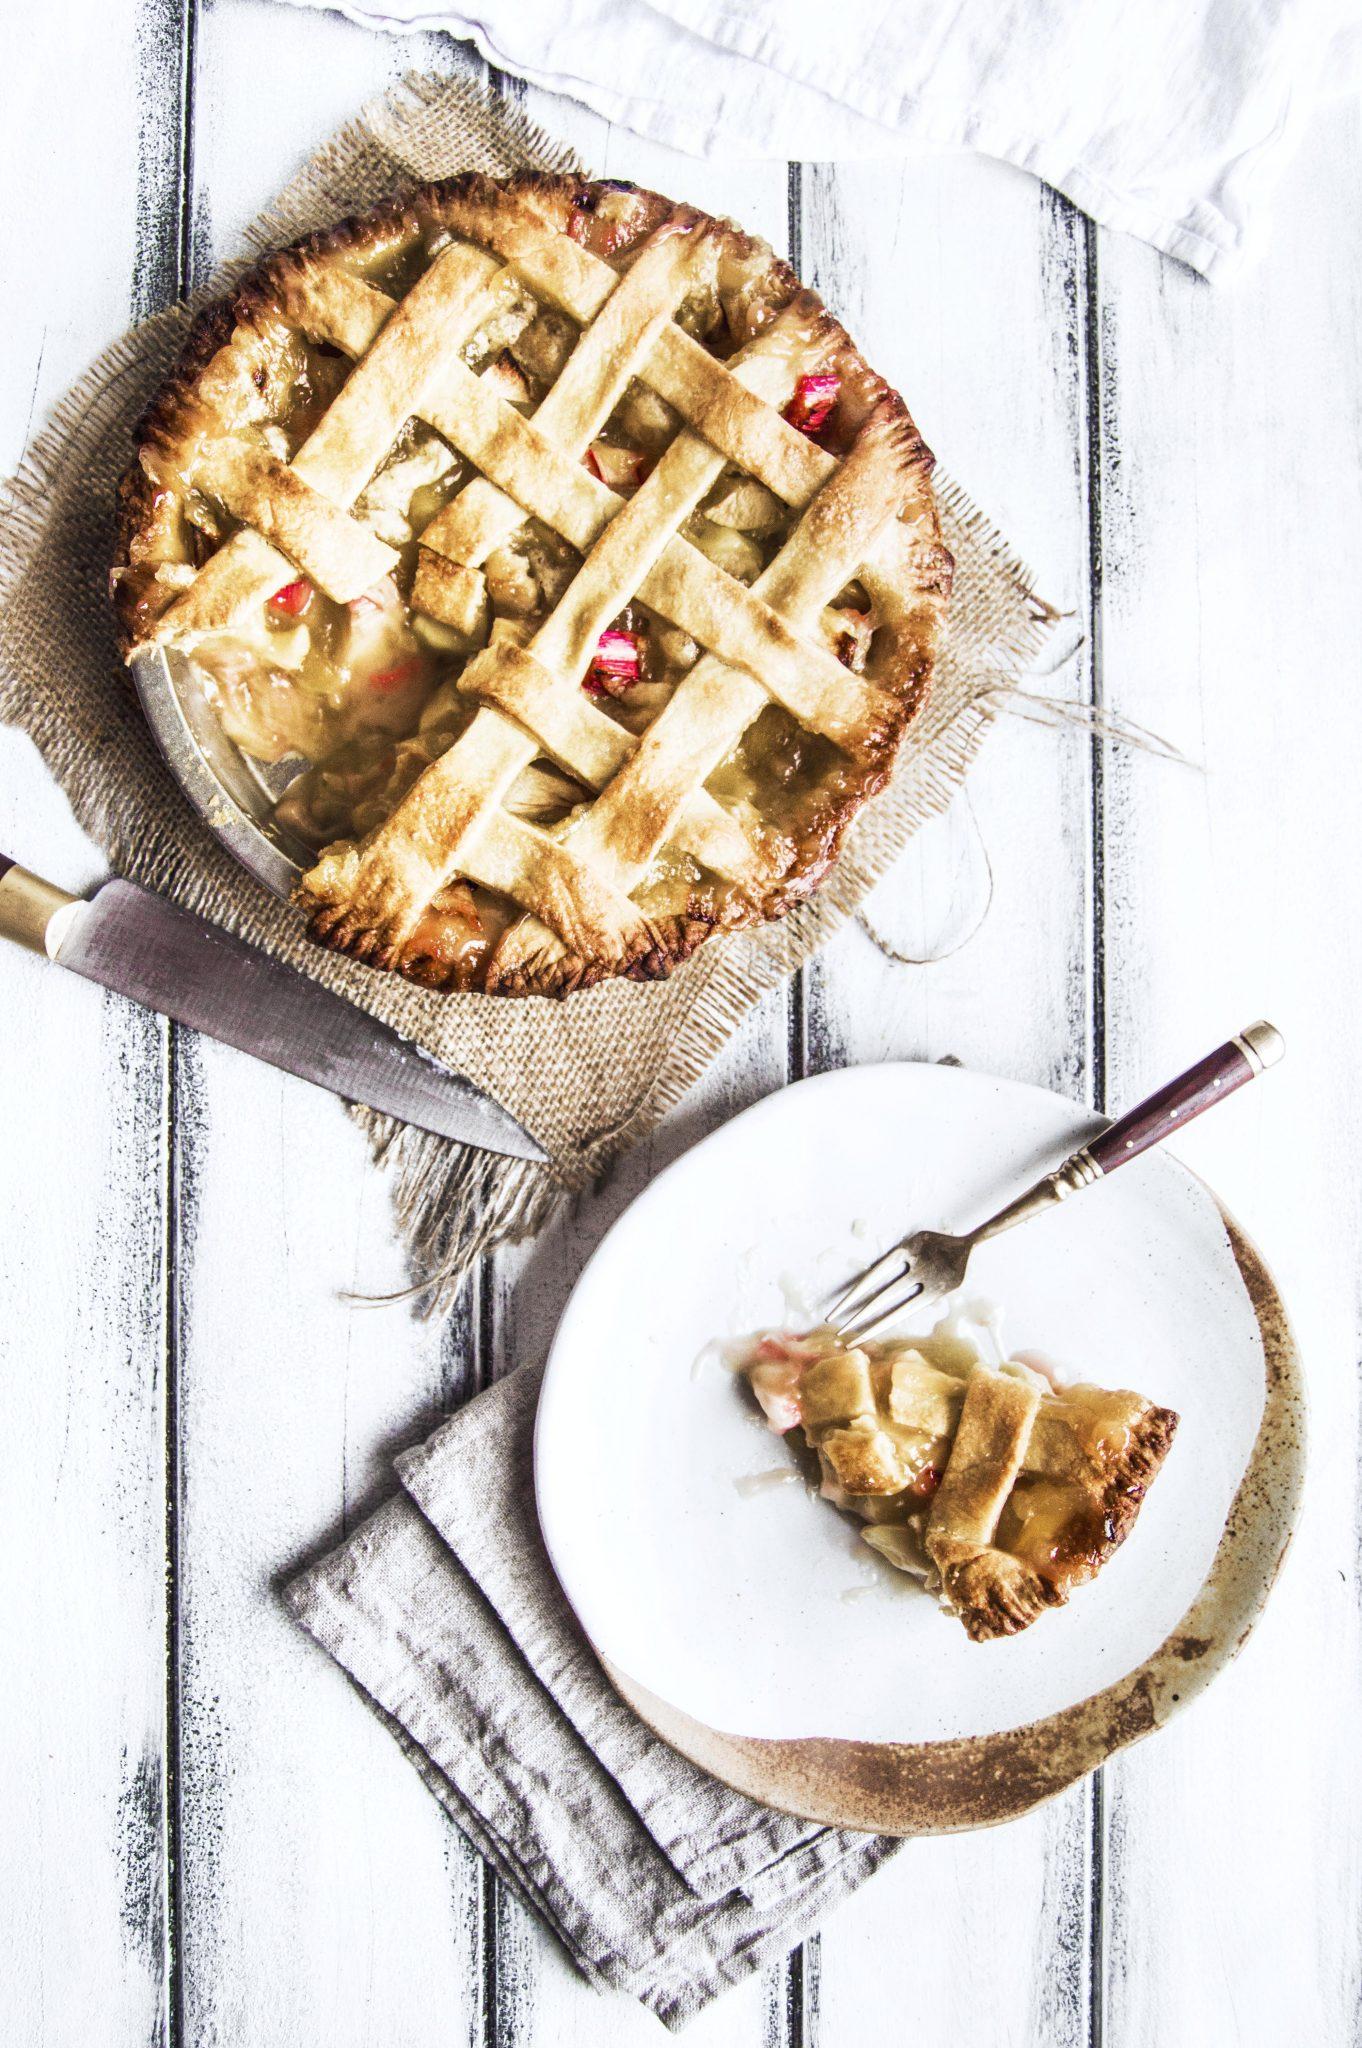 Vegan Apple Rhubarb Pie